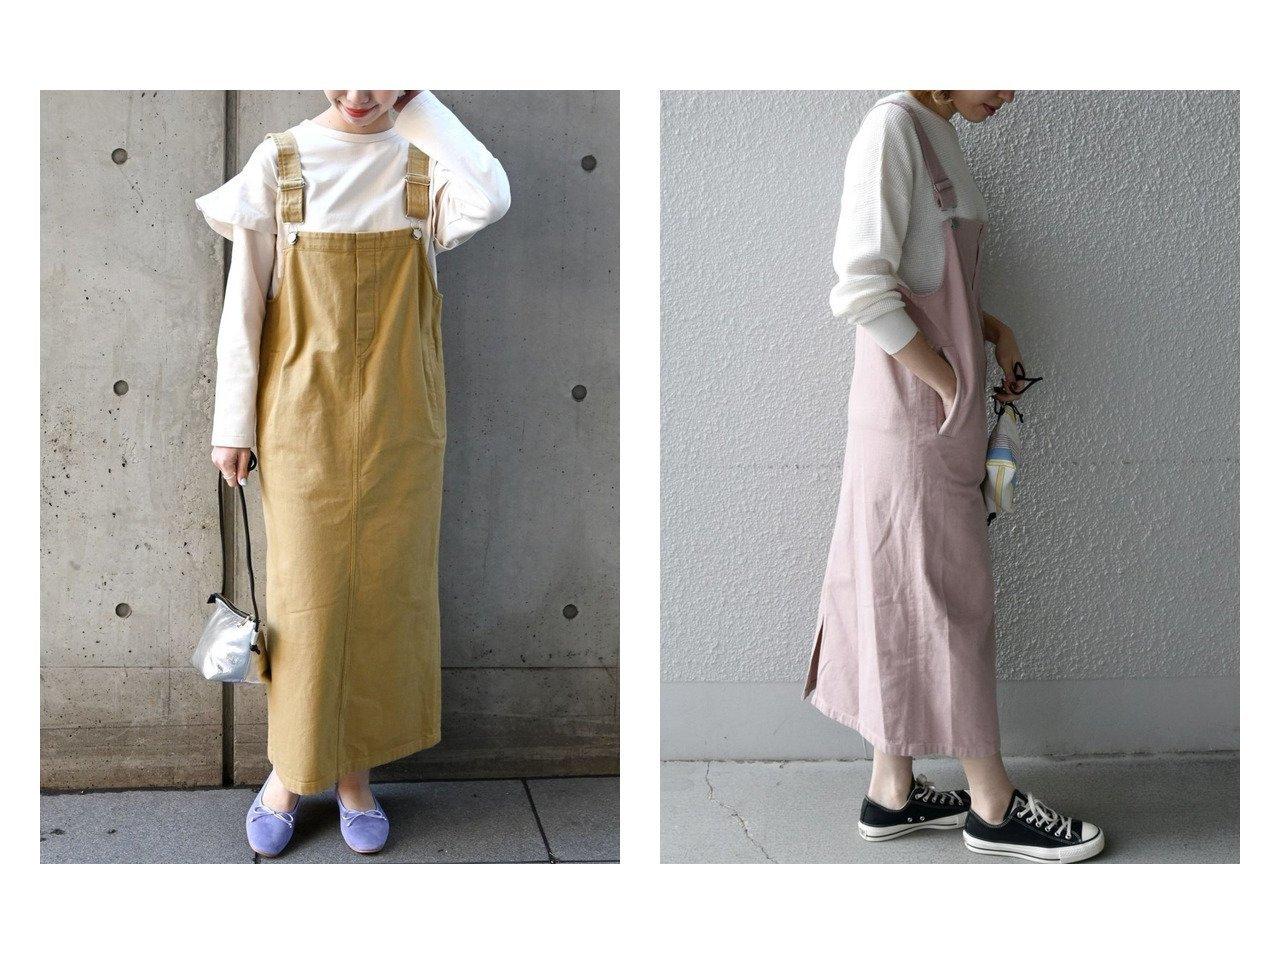 【SHIPS any/シップス エニィ】のSHIPS any FOOD TEXTILE ジャンパースカート 【スカート】おすすめ!人気、トレンド・レディースファッションの通販   | レディースファッション・服の通販 founy(ファニー)